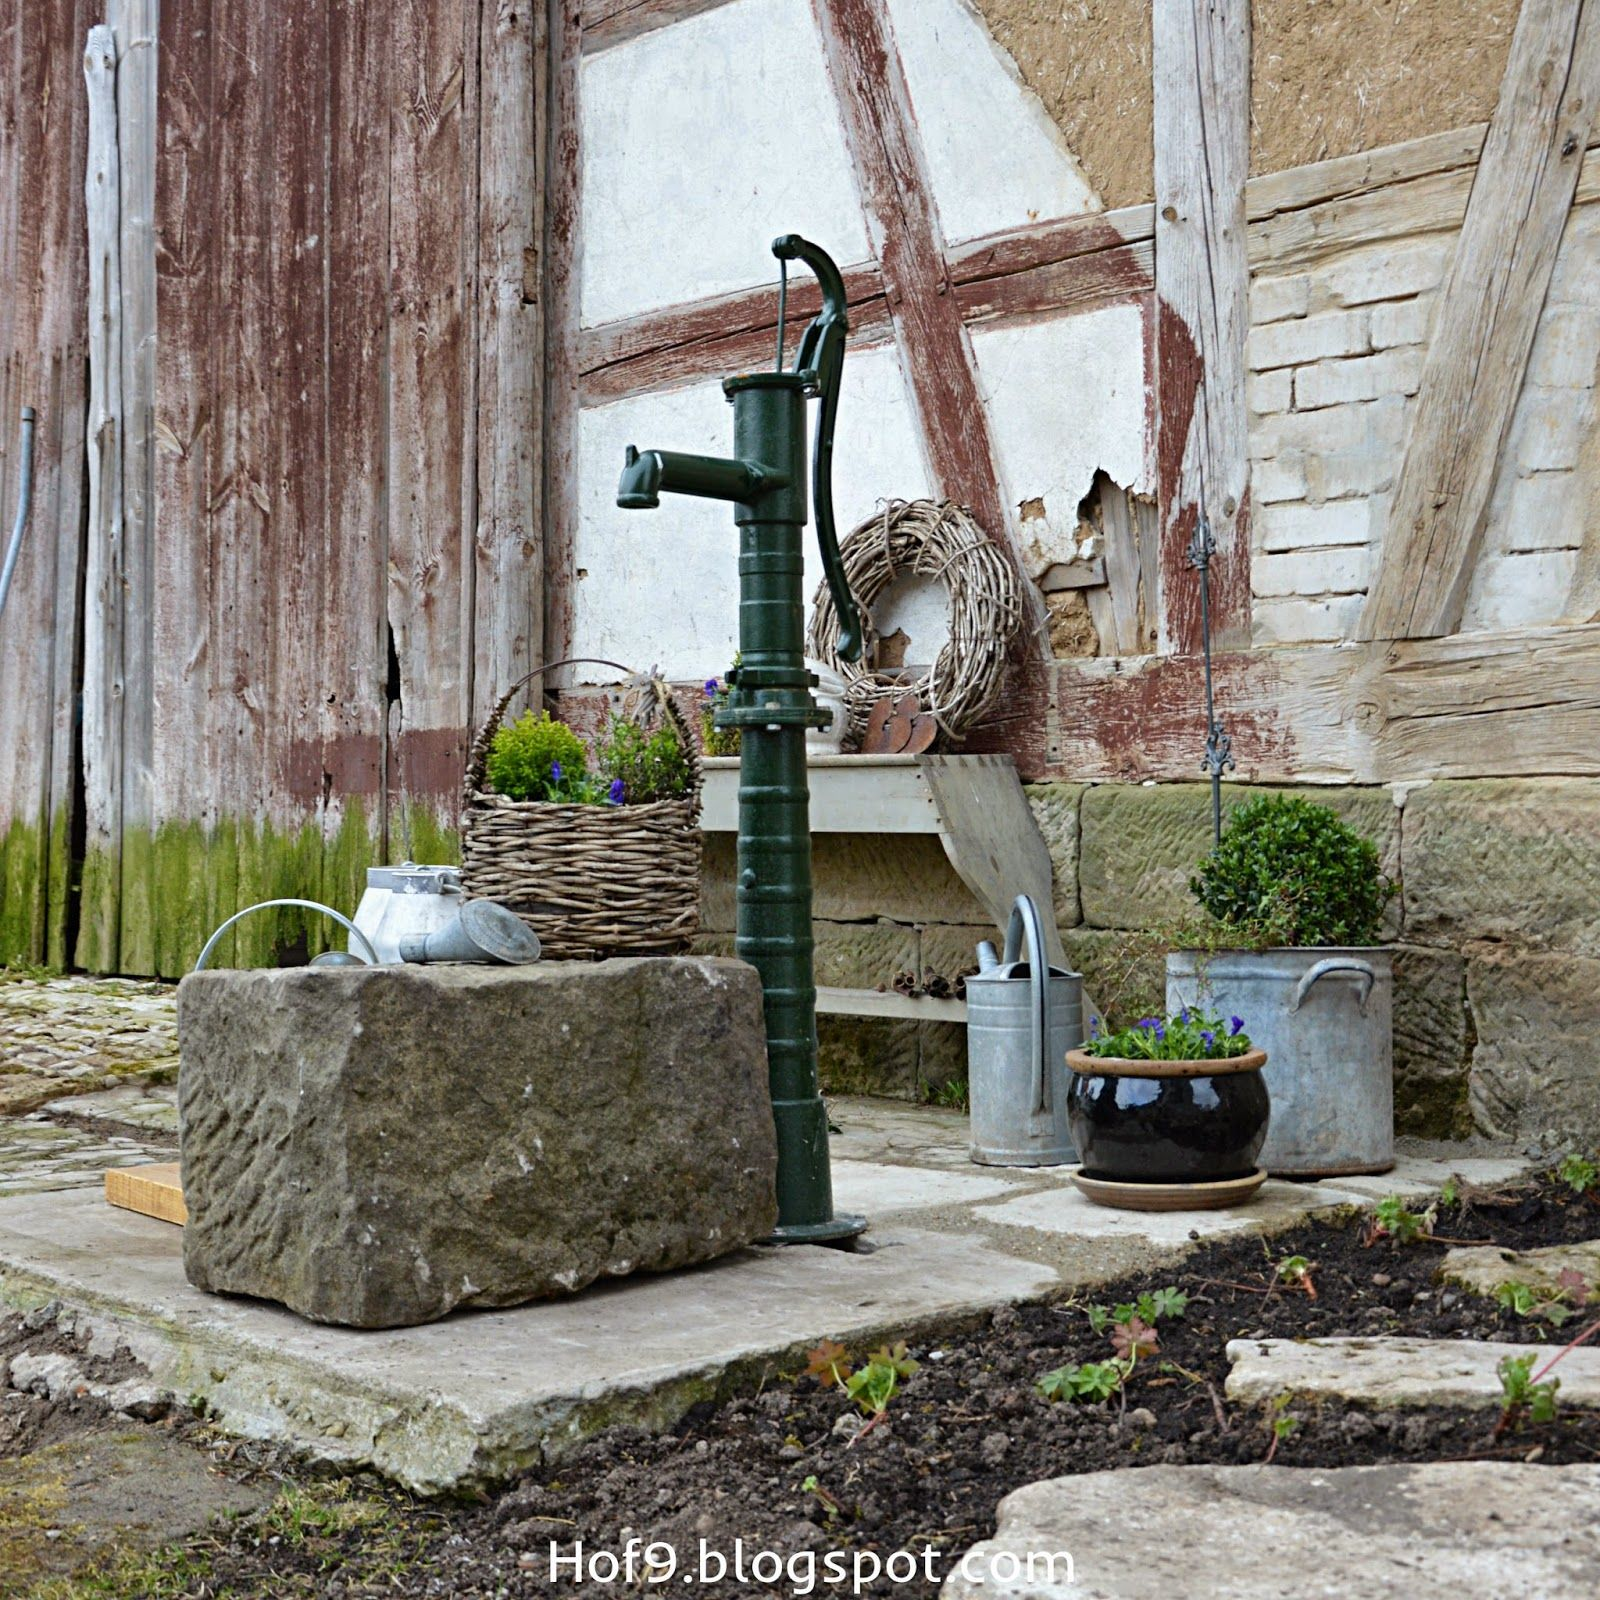 Eine Ziemlich Tiefe Berraschung Brunnen Garten Garten Dekoration Diy Garten Dekoration Diy Garten Dekor Water Fountains Outdoor Floor Plants Lawn Art